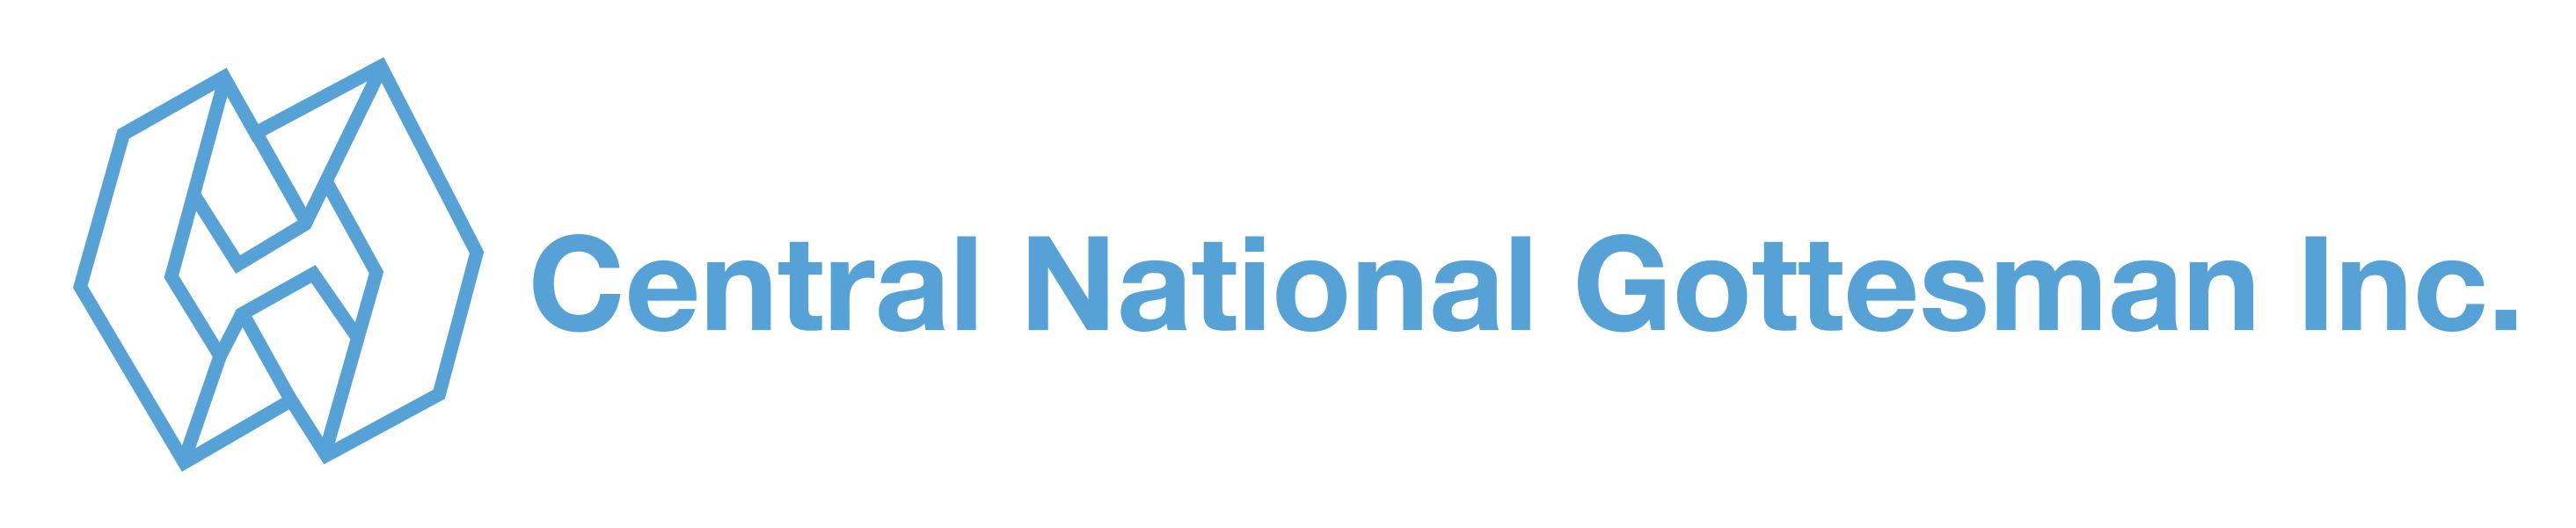 central-national-gottesman-inc